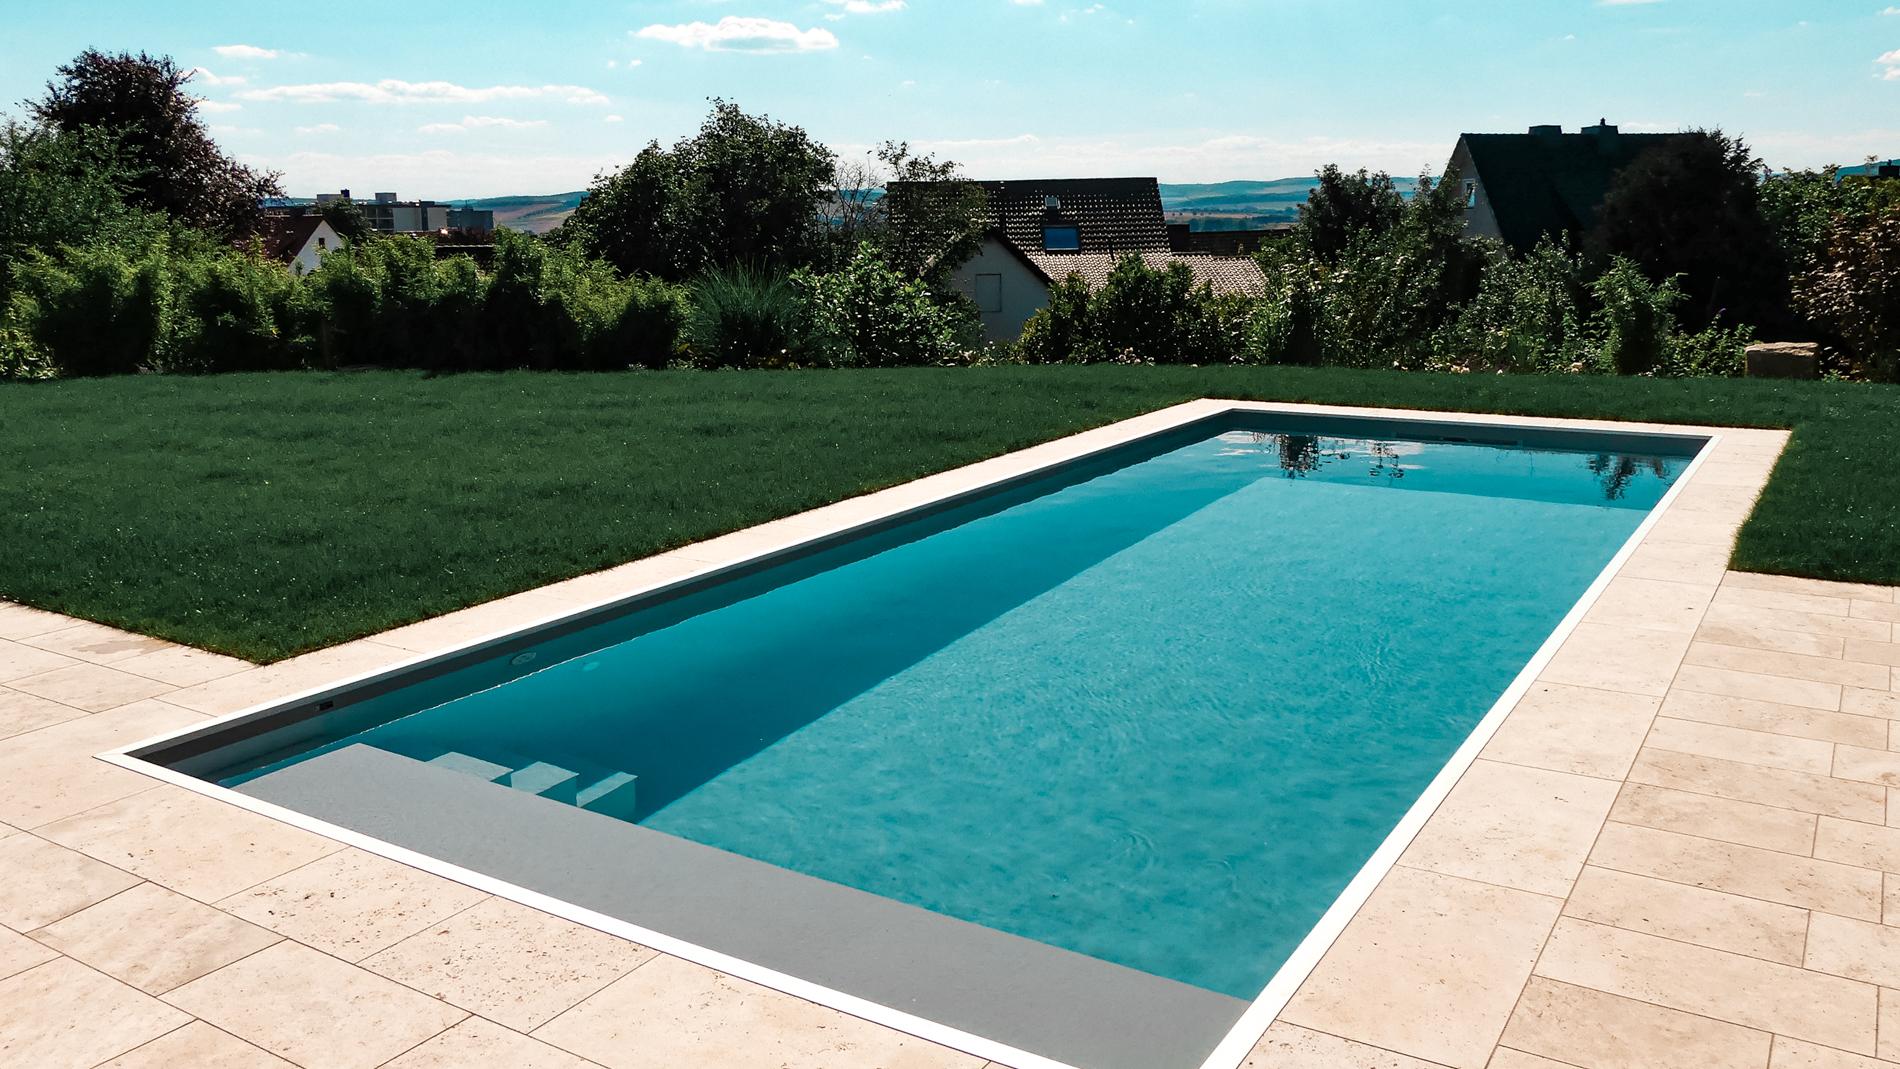 Harz Pool